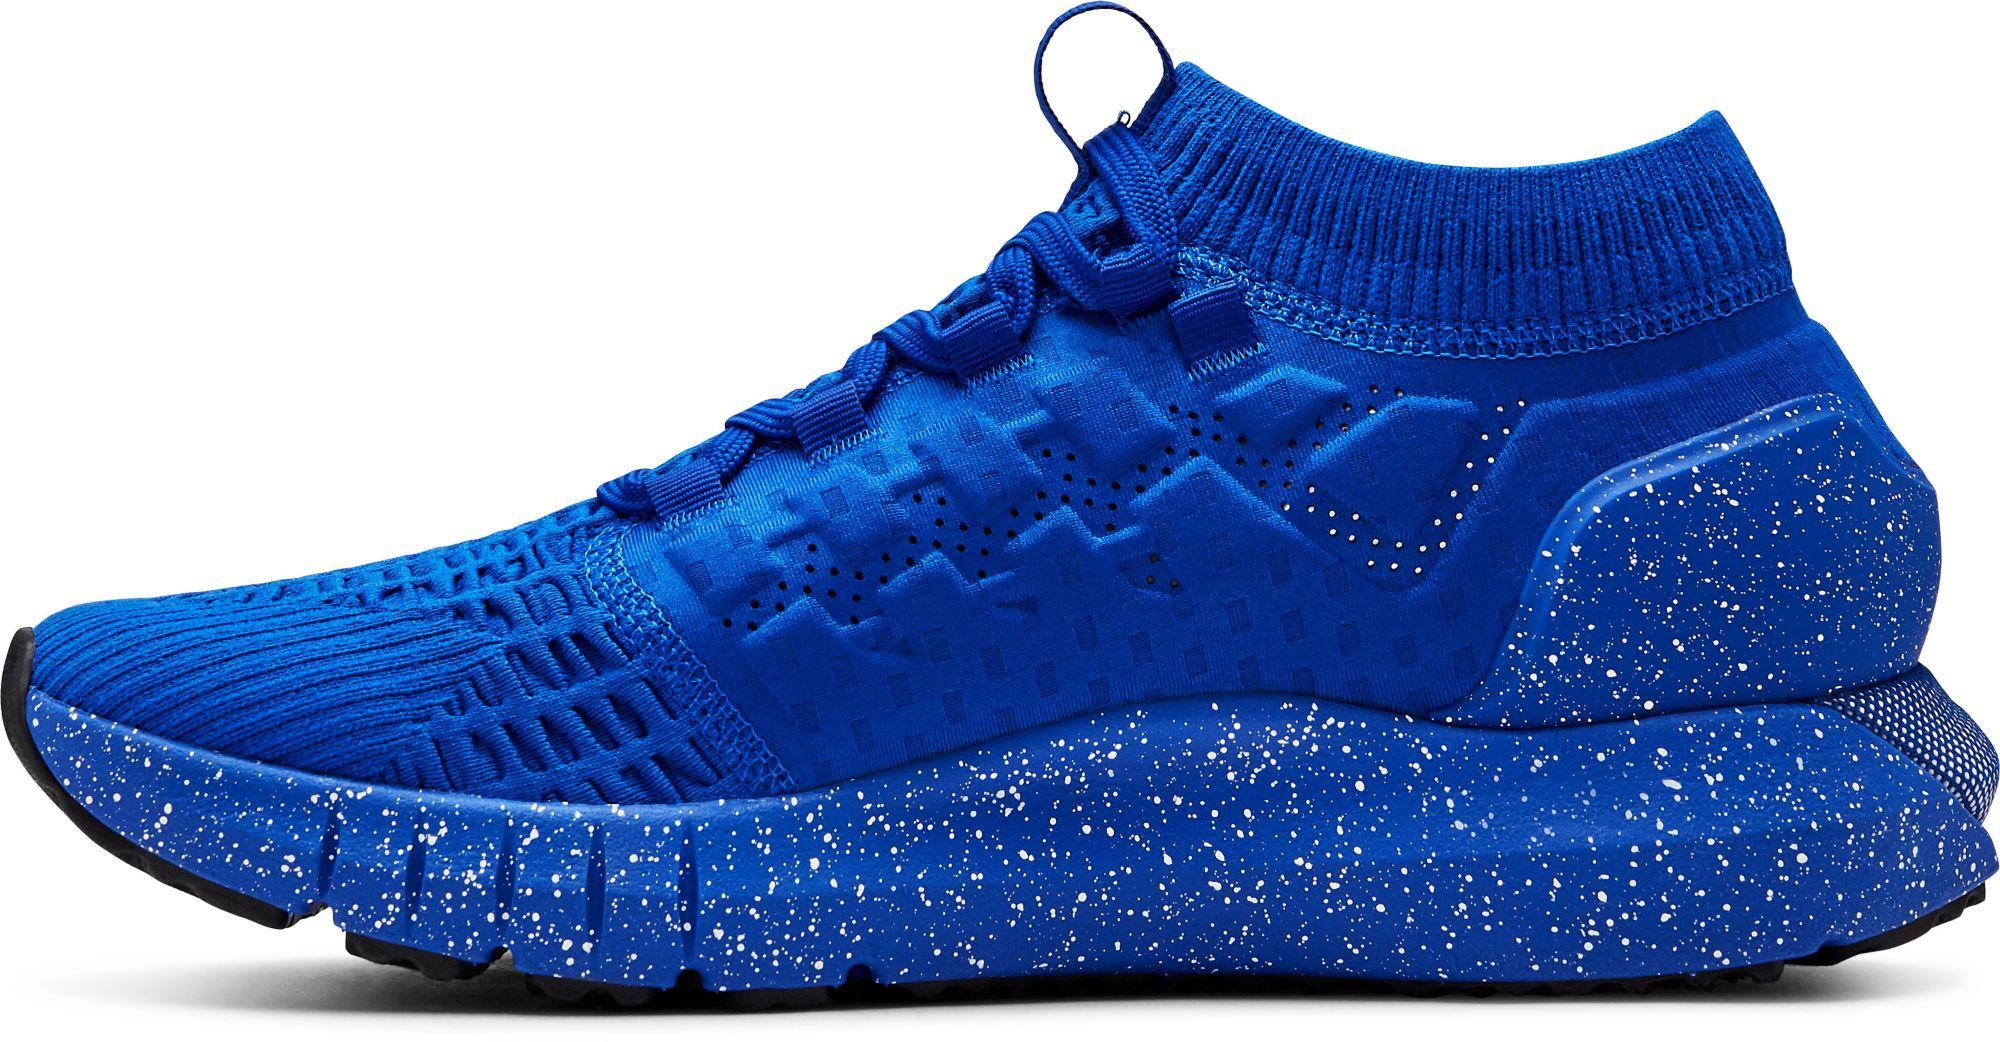 huge discount 67a1d fc5e4 Men's Blue Hovr Phantom Confetti Running Shoes